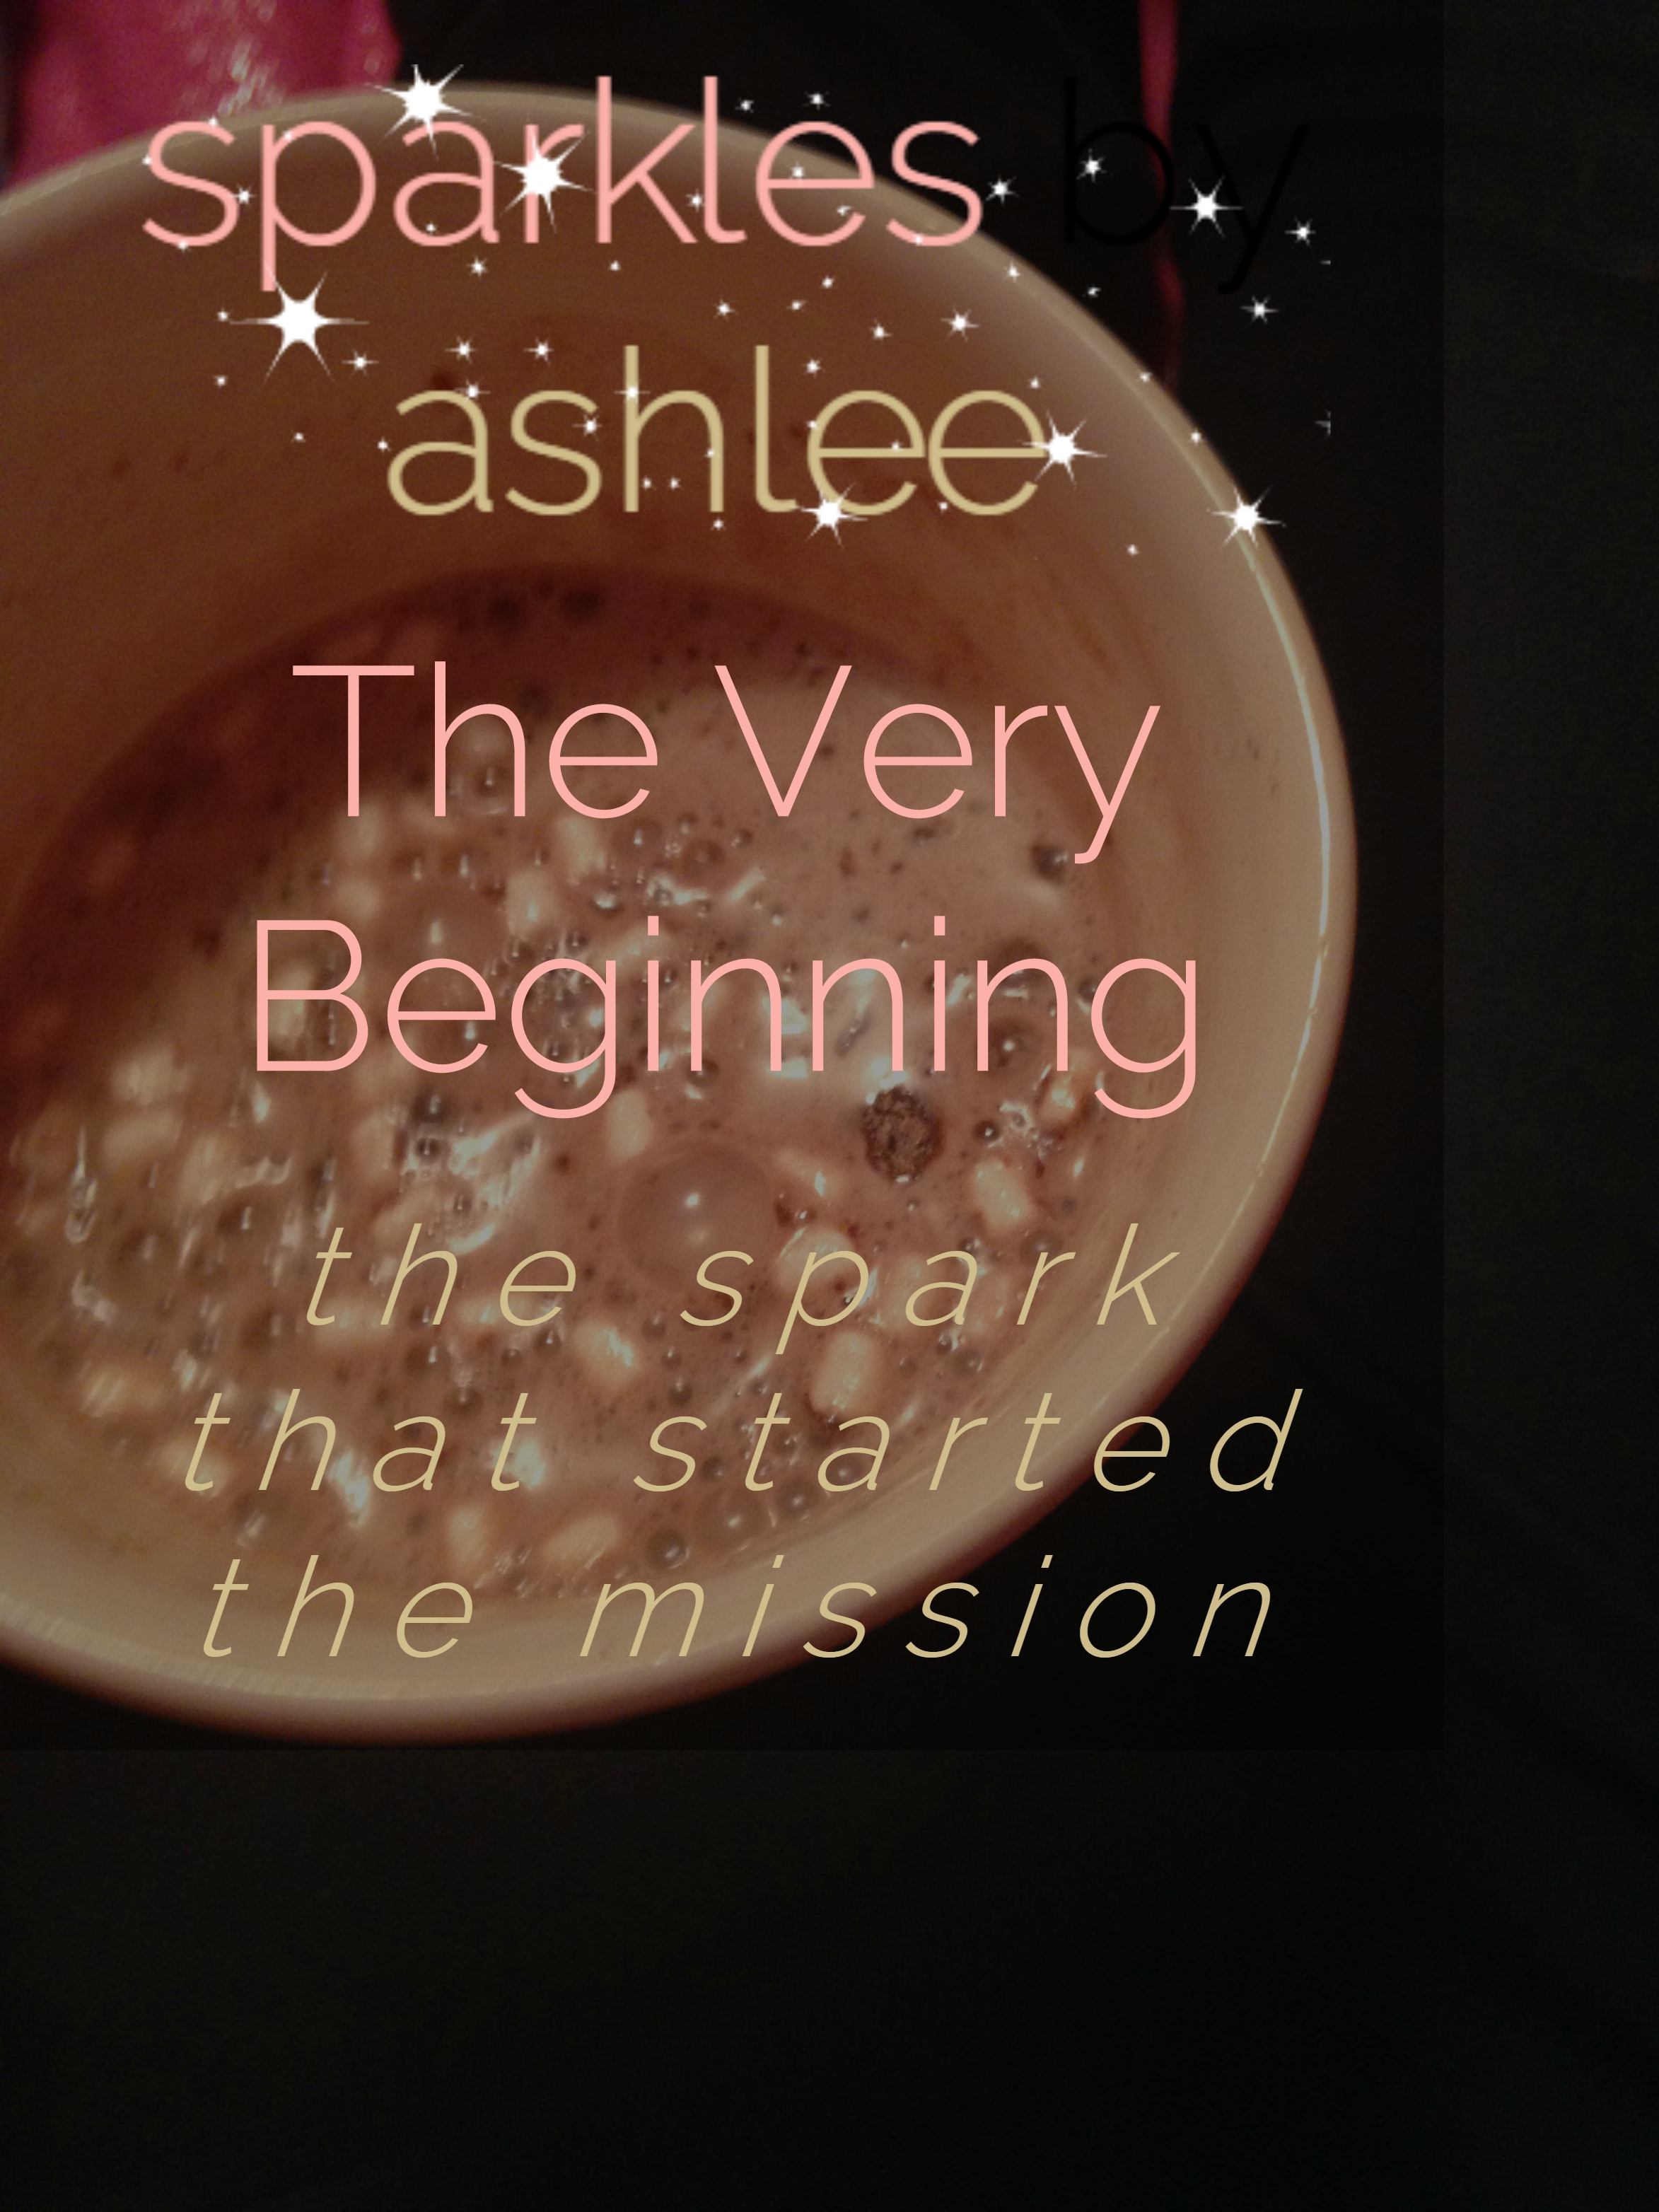 The-Very-Beginning-Sparkles-by-Ashlee.jpg